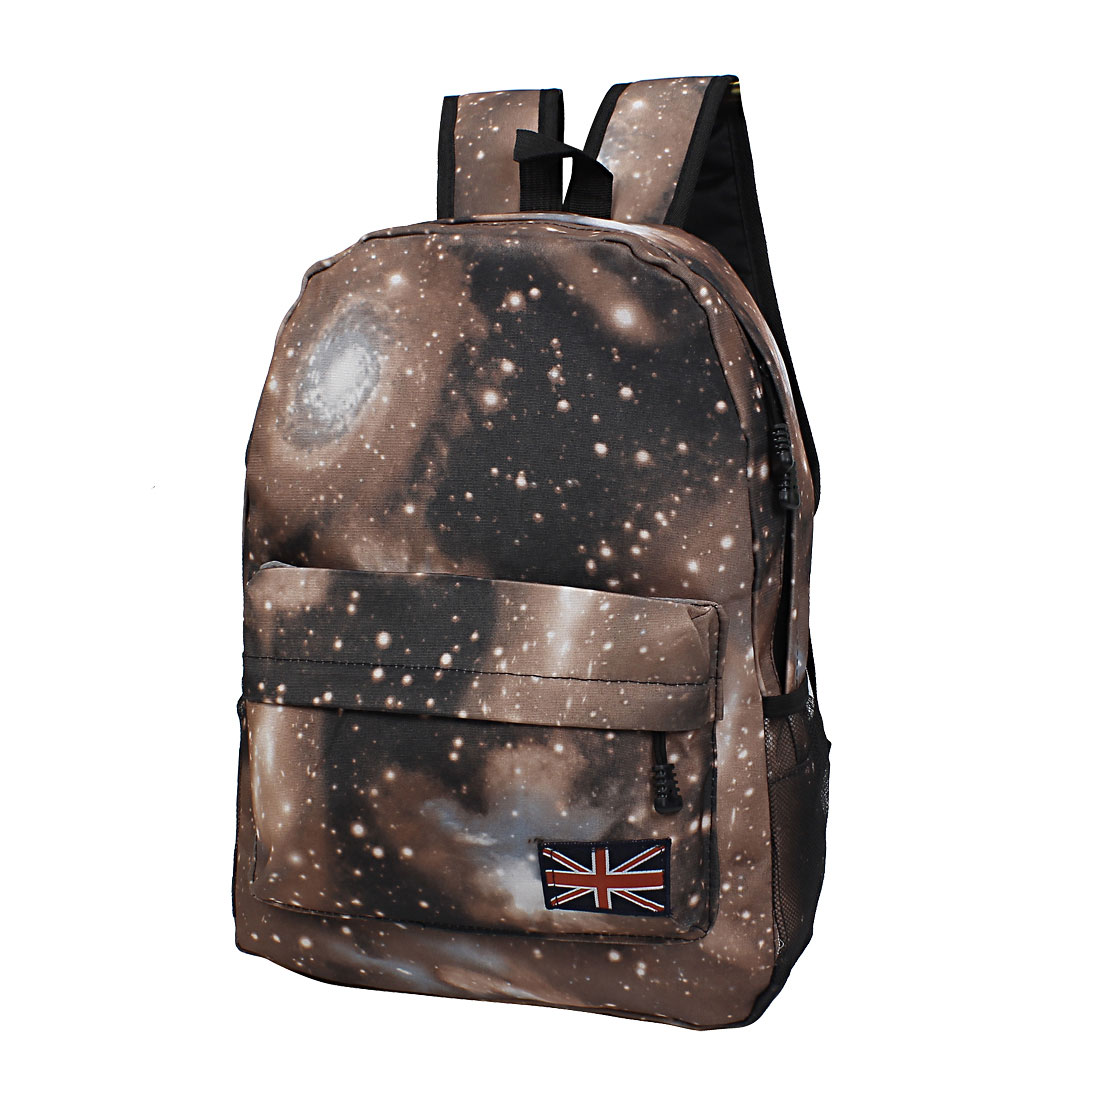 New Galaxy Space Backpack Rucksack Canvas Bag School Bookbag Satchel Brown